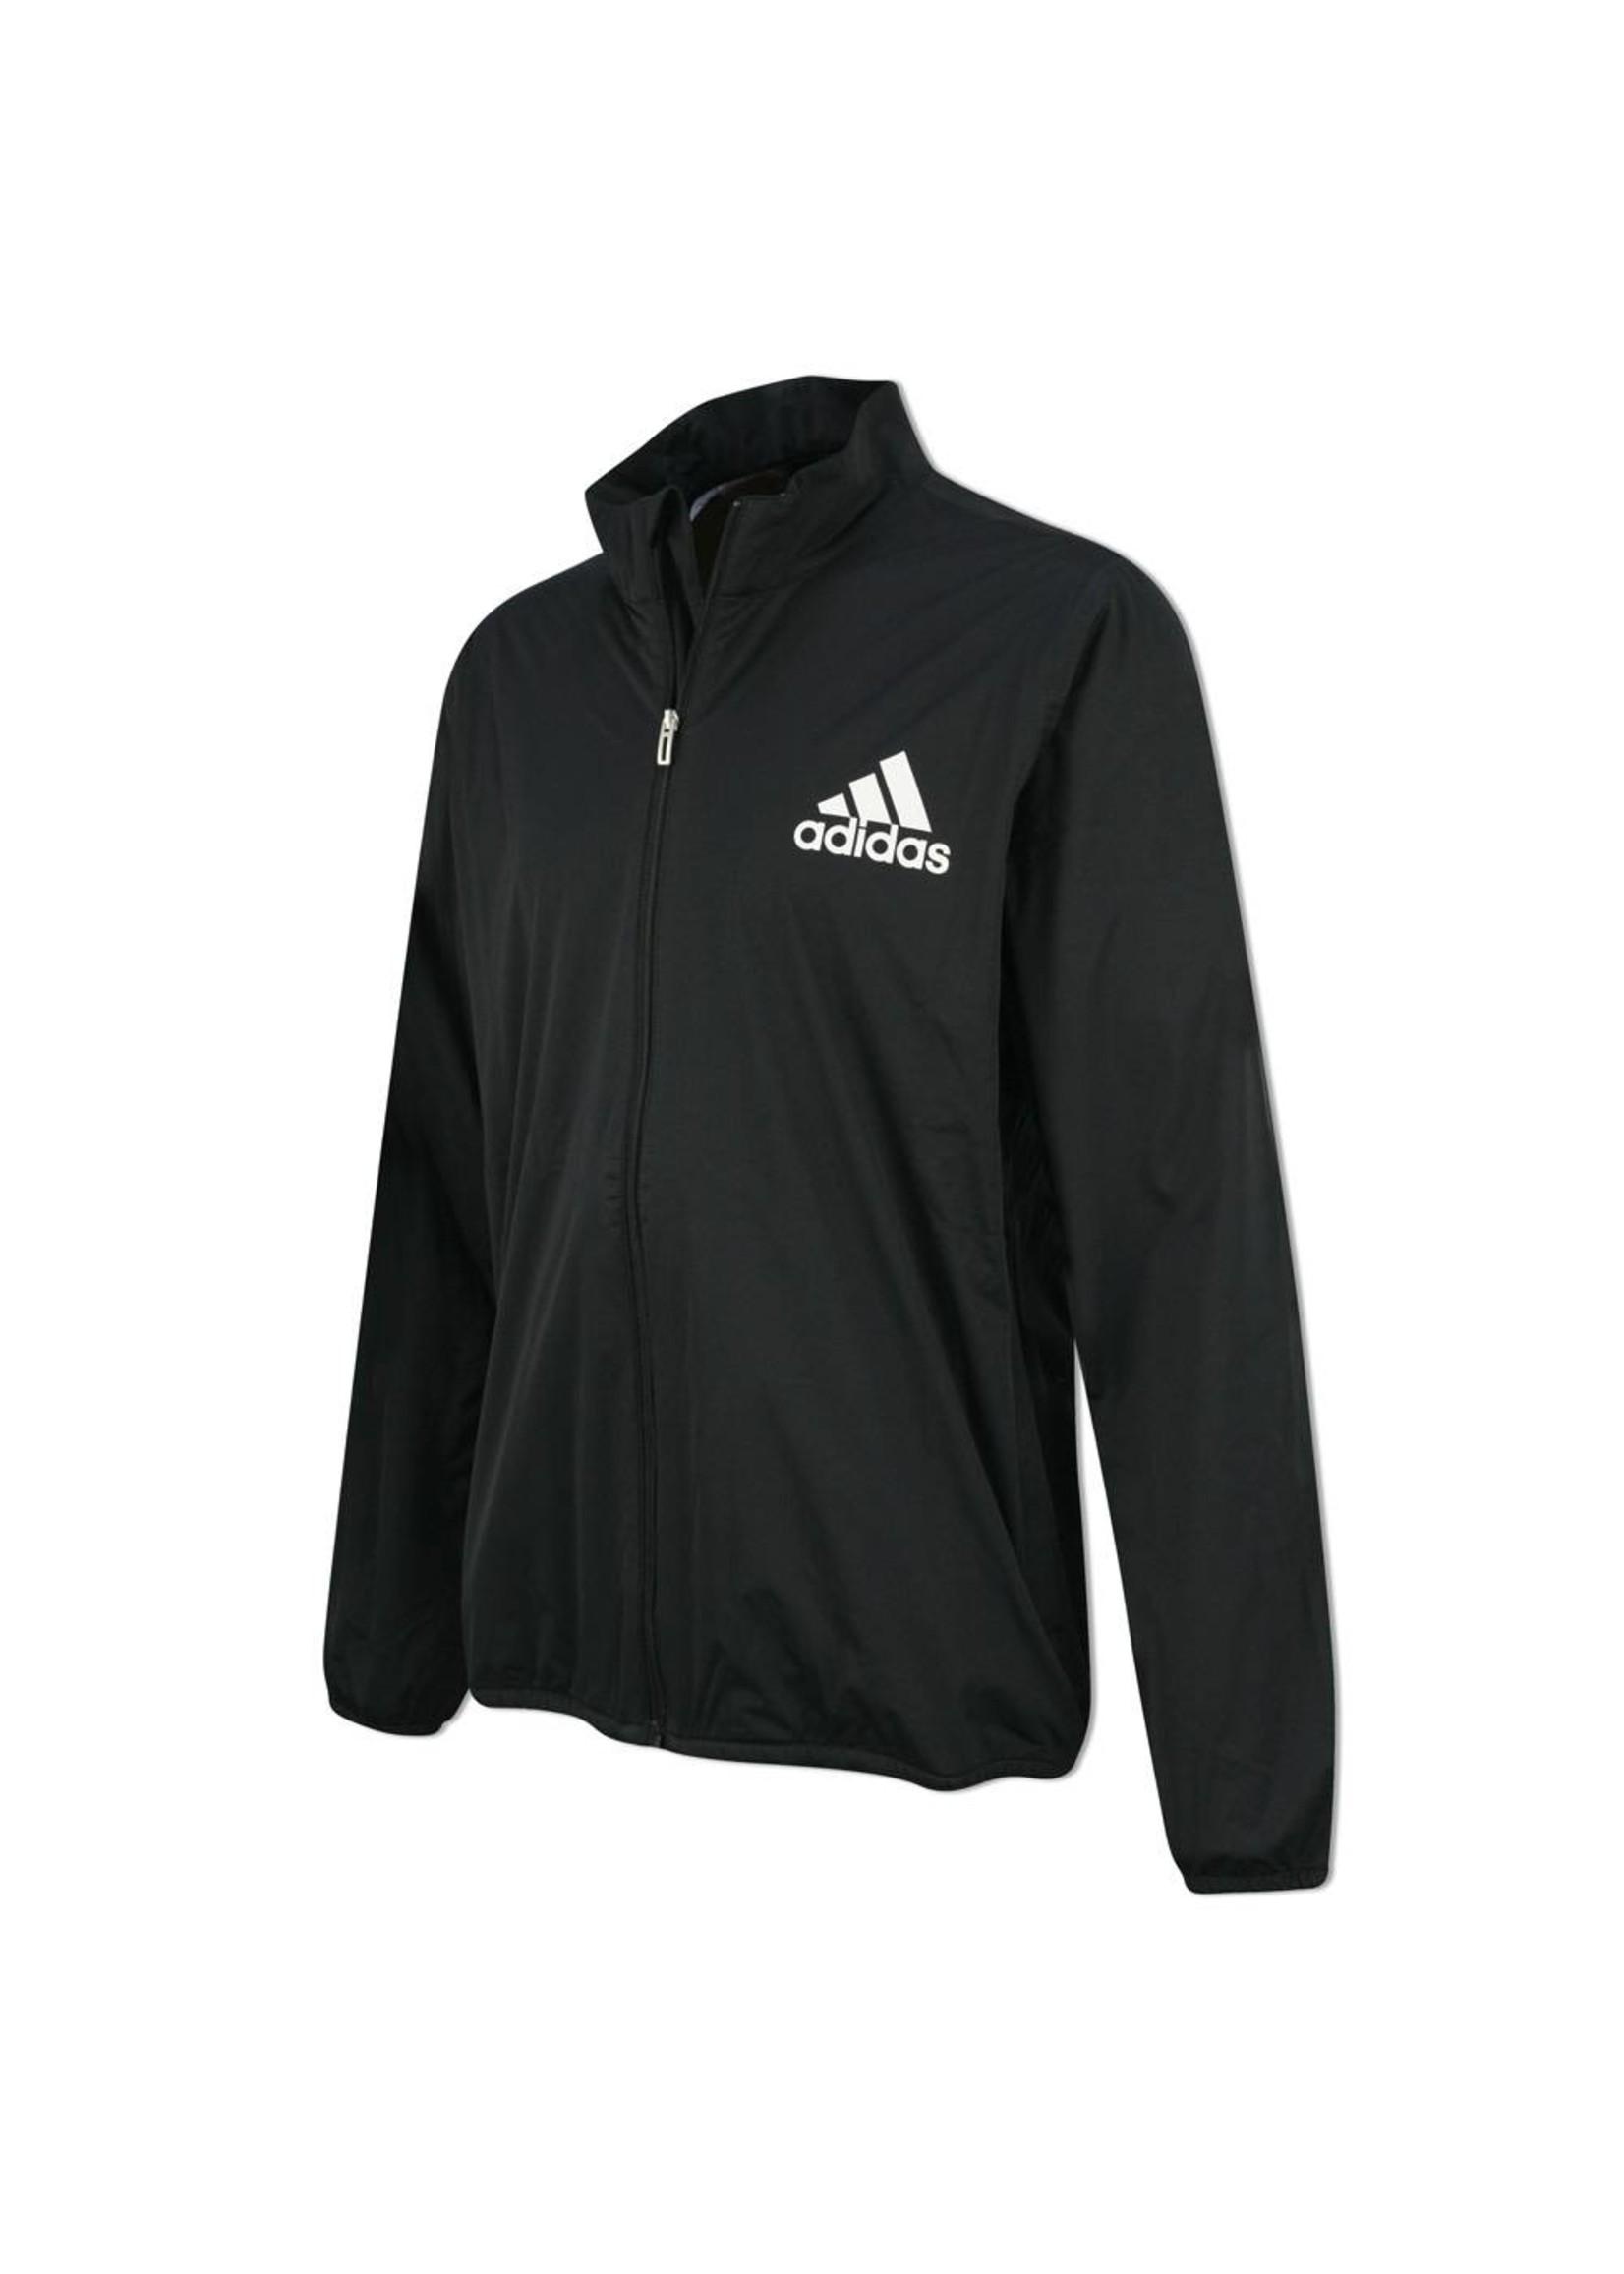 Adidas Adidas Junior Climastorm Packable Jacket (2018)